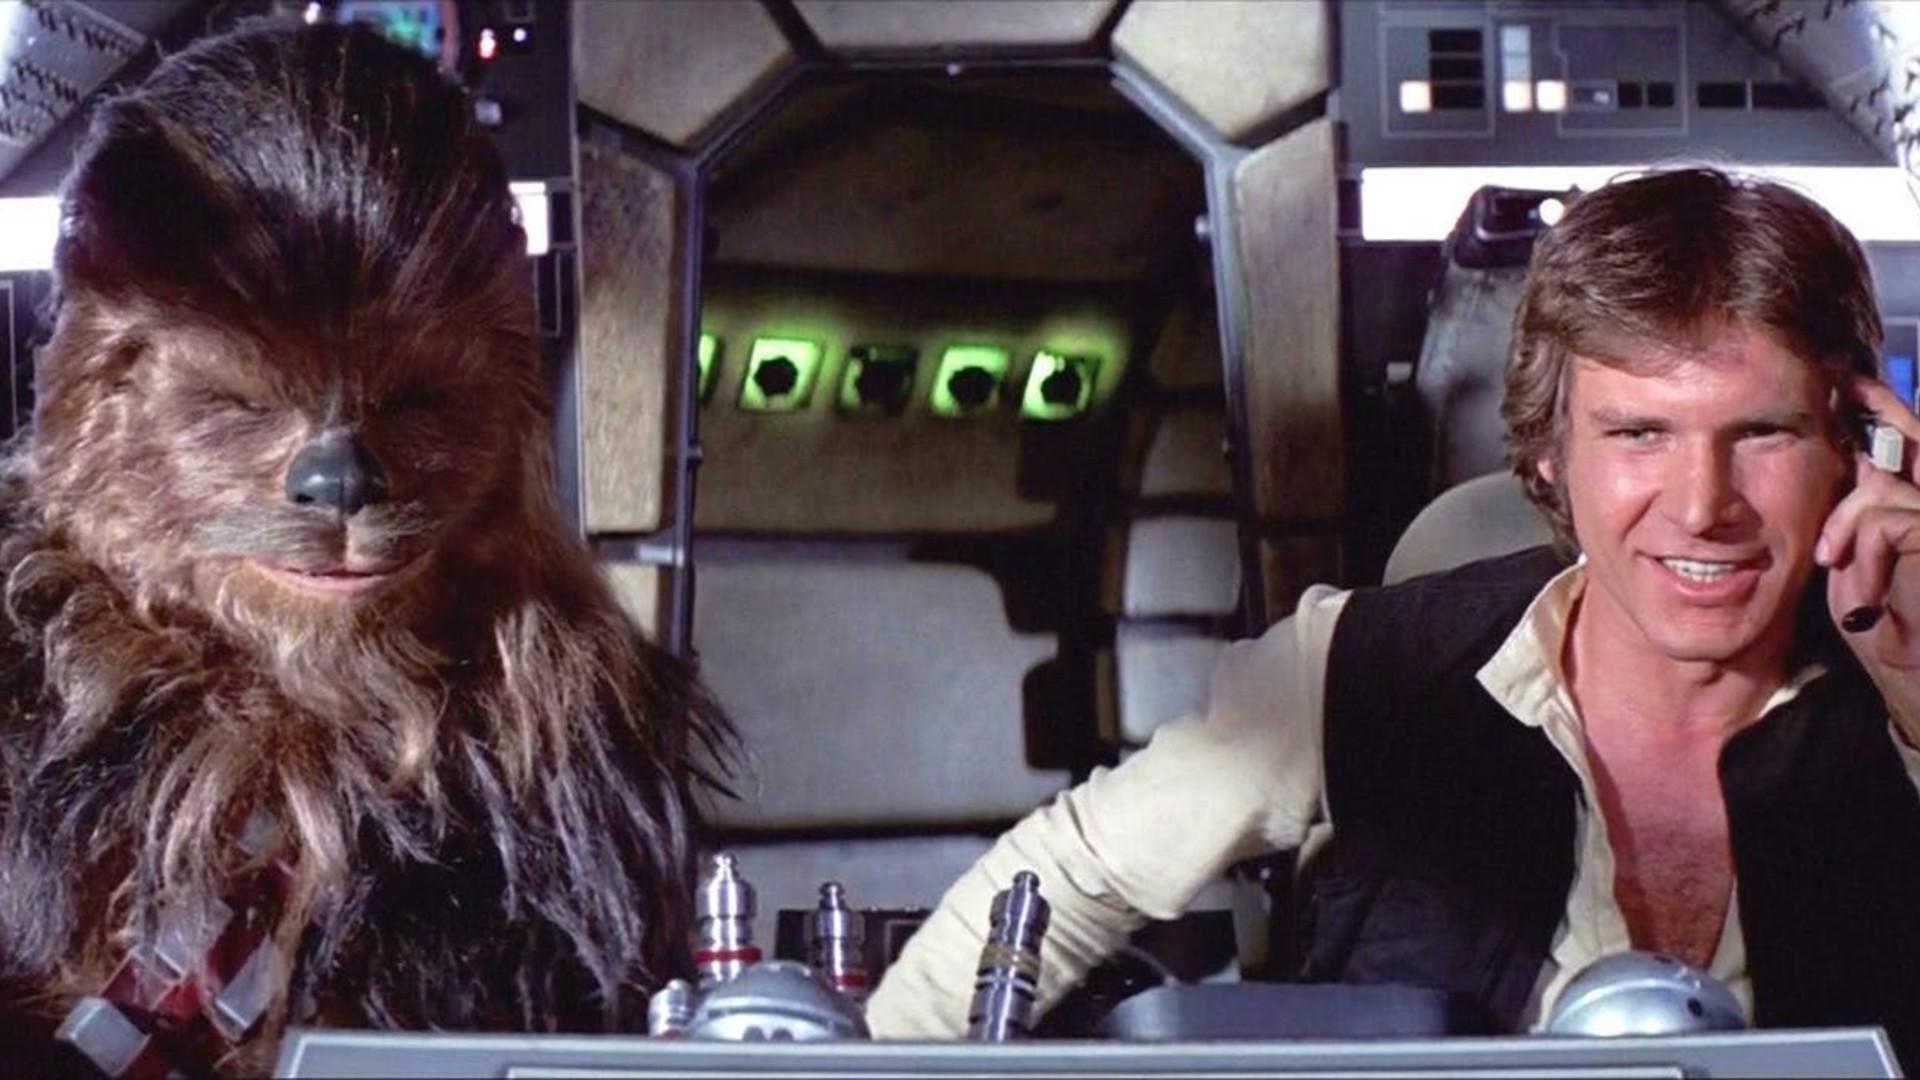 A Valheim player has built the Millennium Falcon from Star Wars